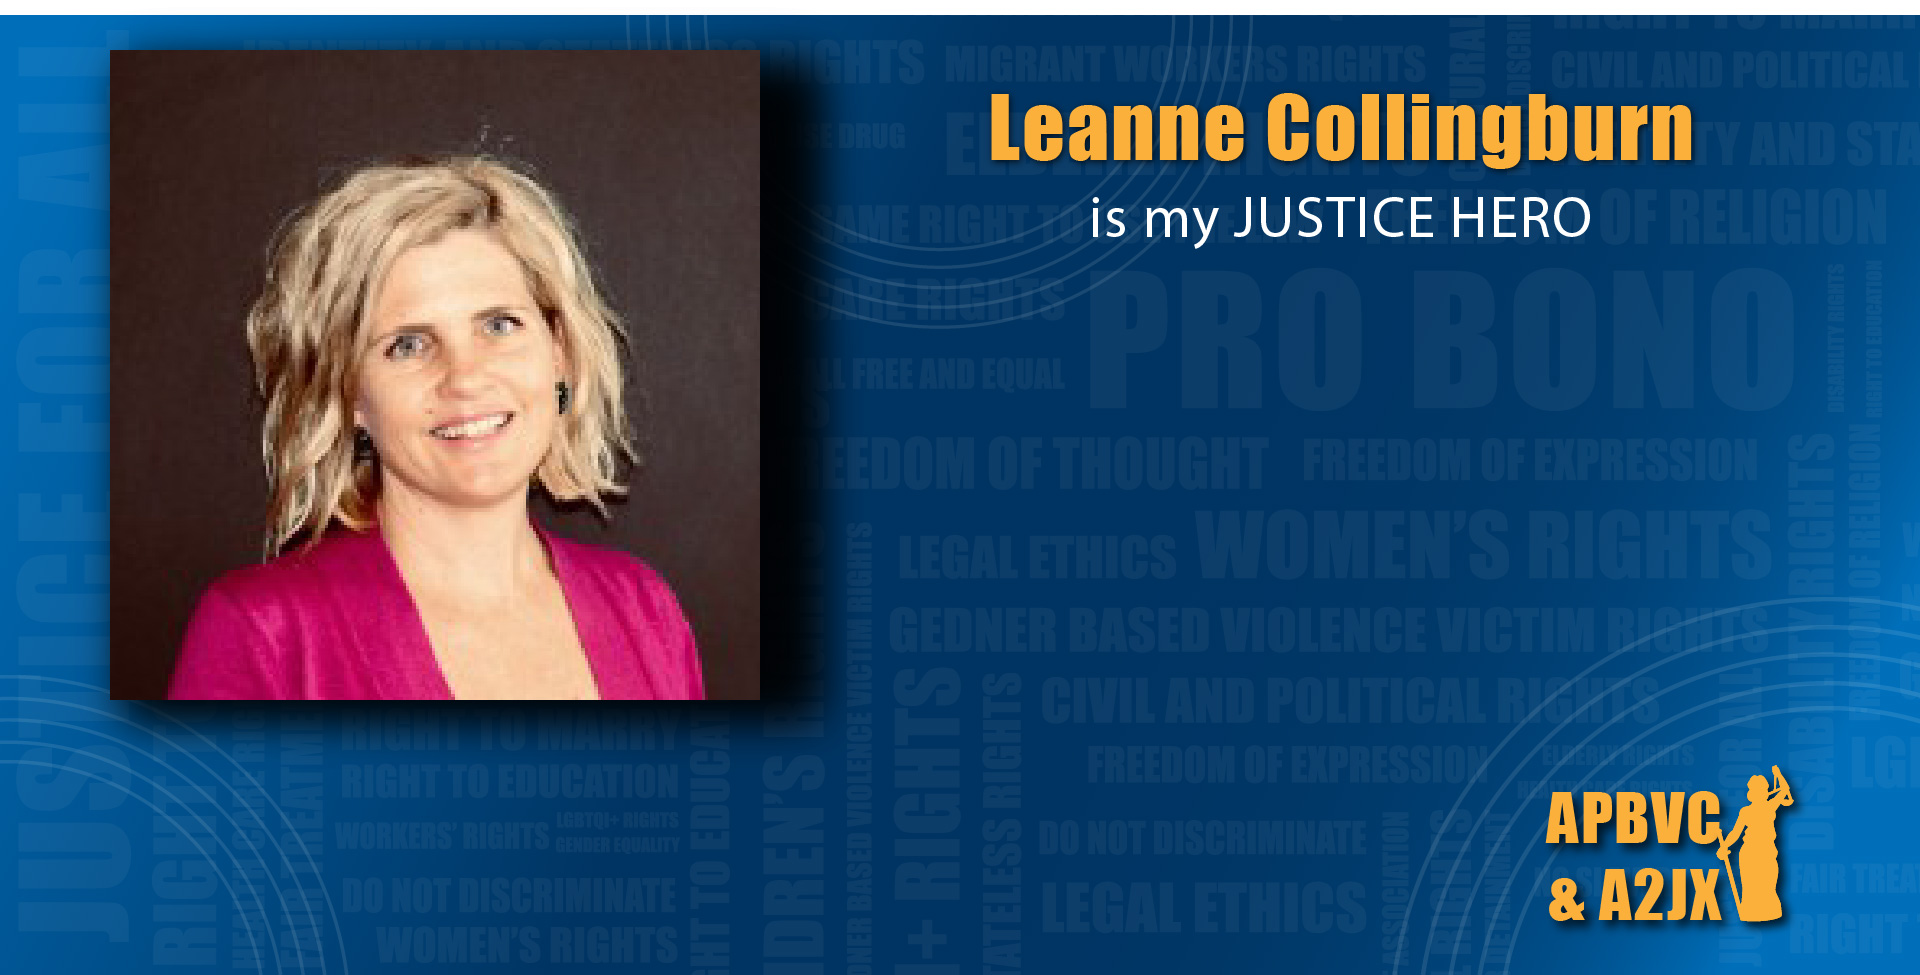 Leanne Collingburn